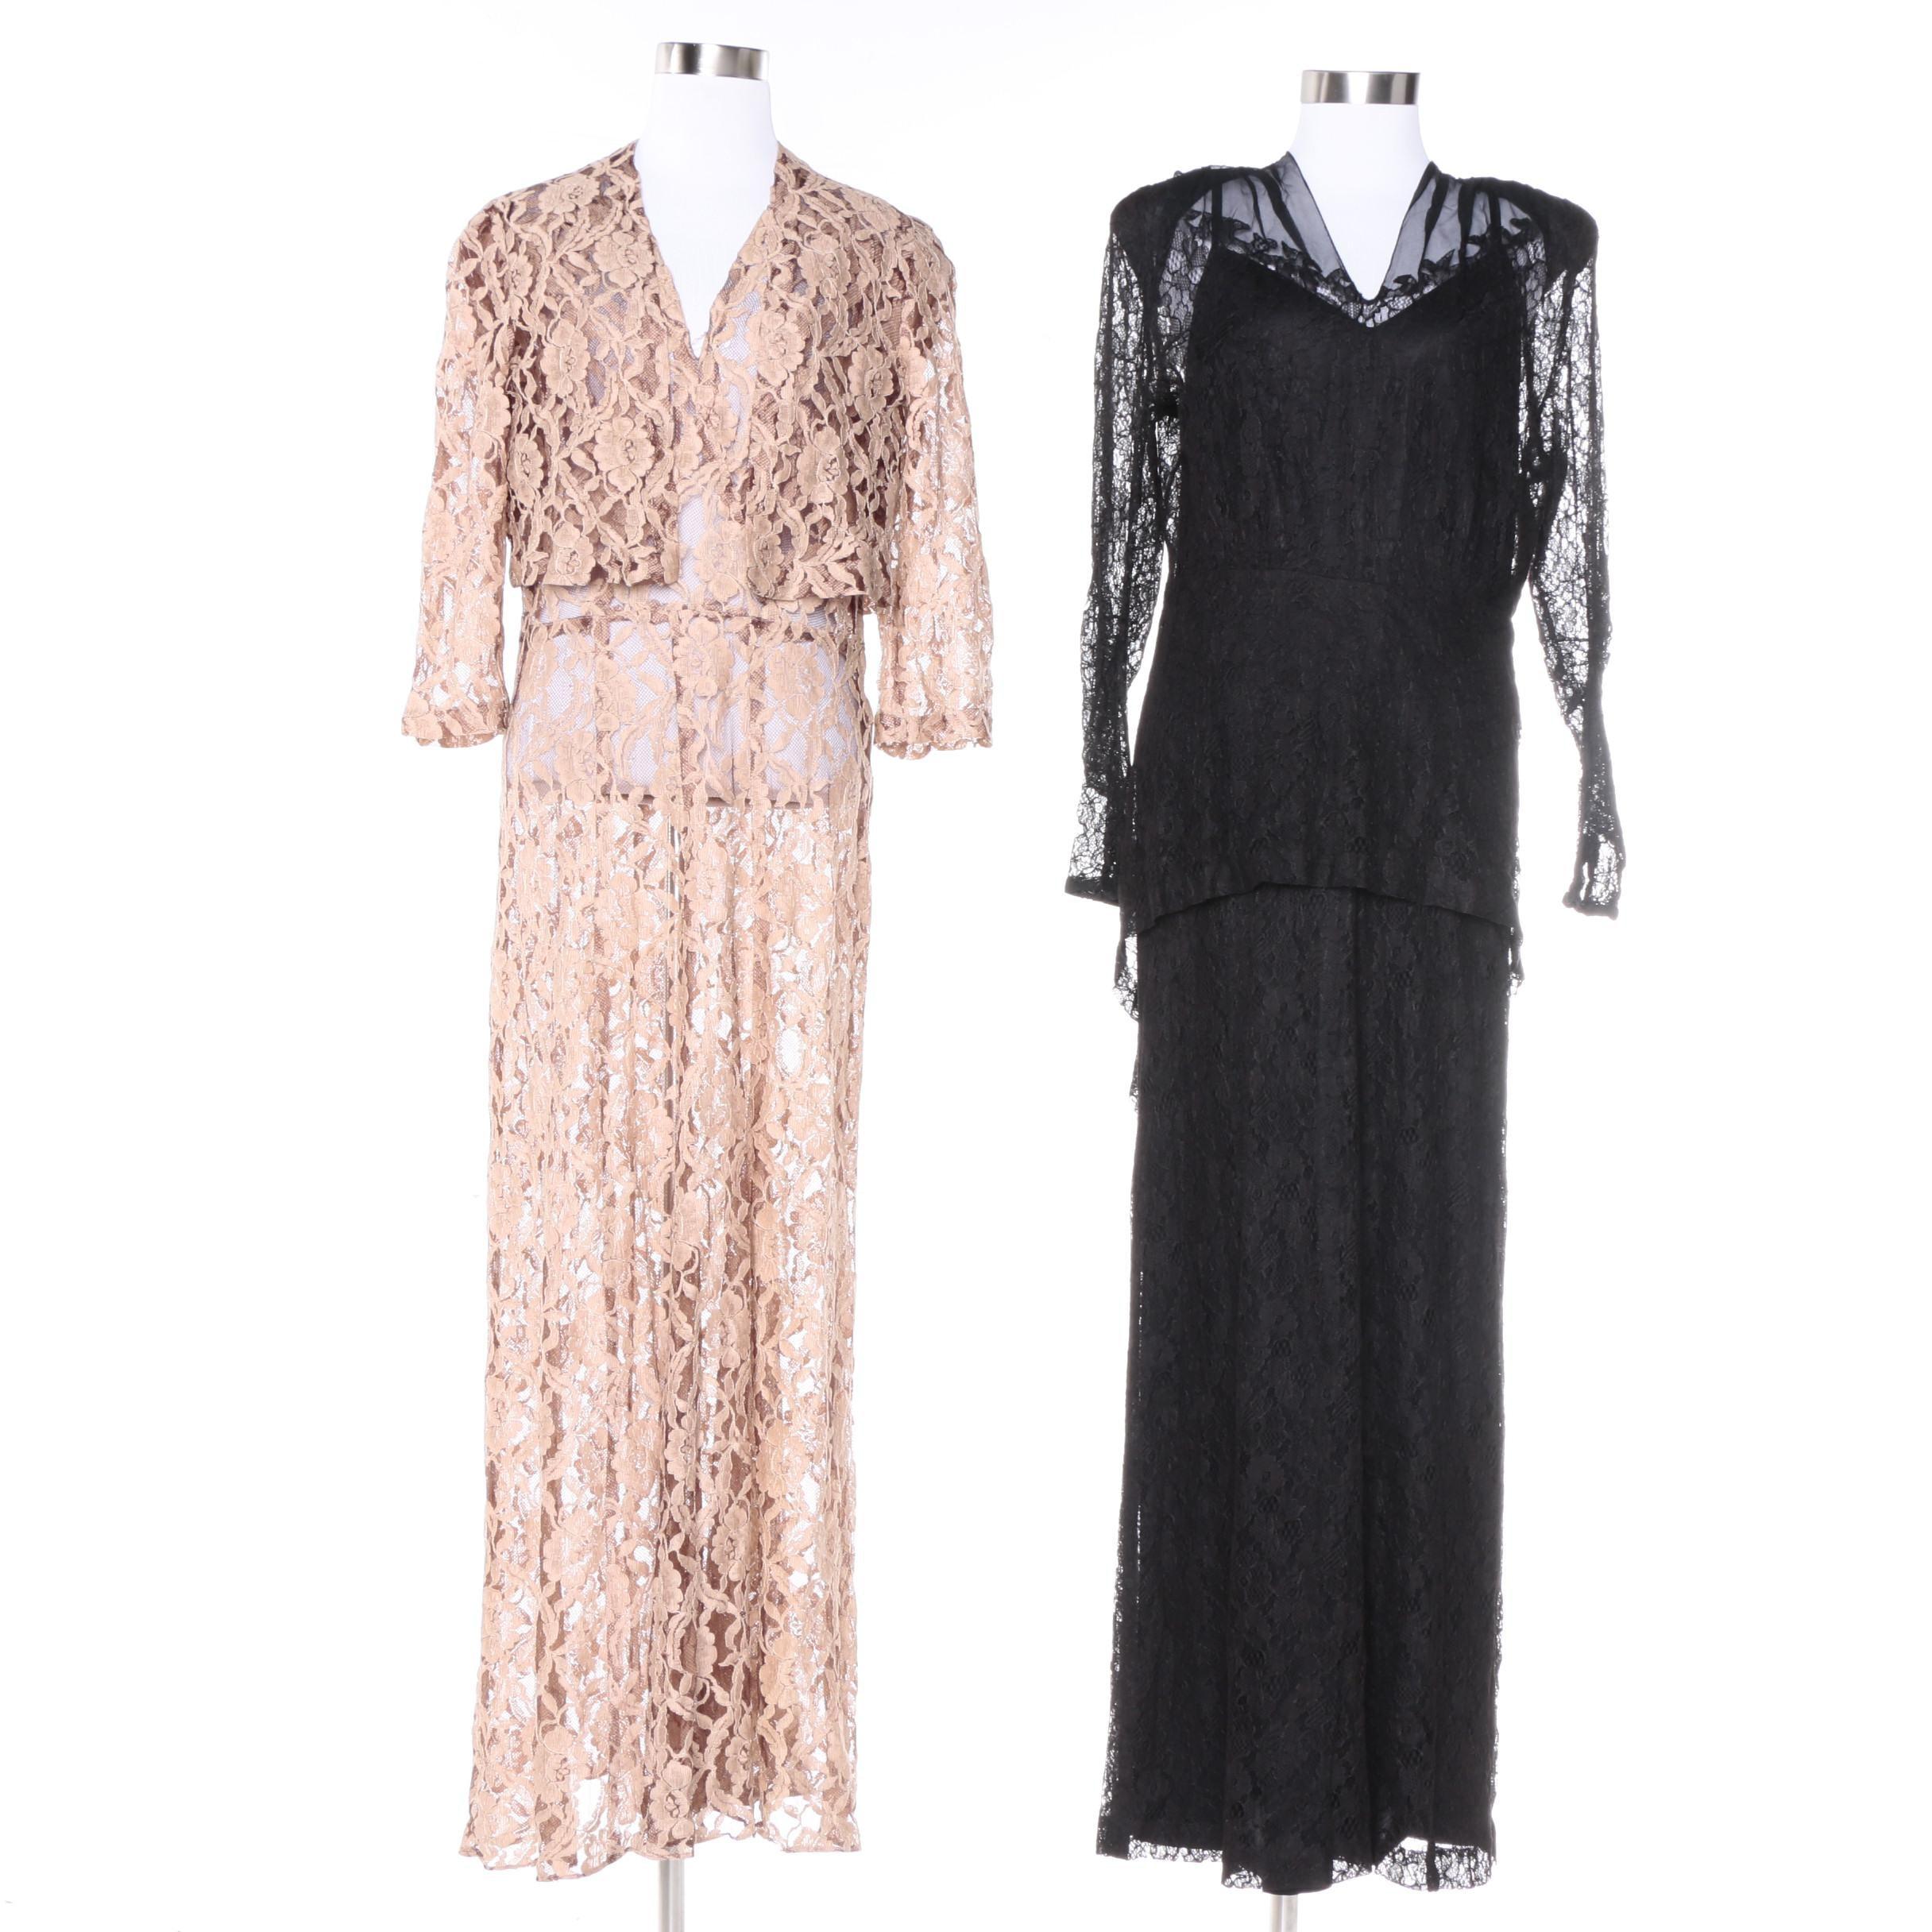 Women's Circa 1940s Vintage Dresses